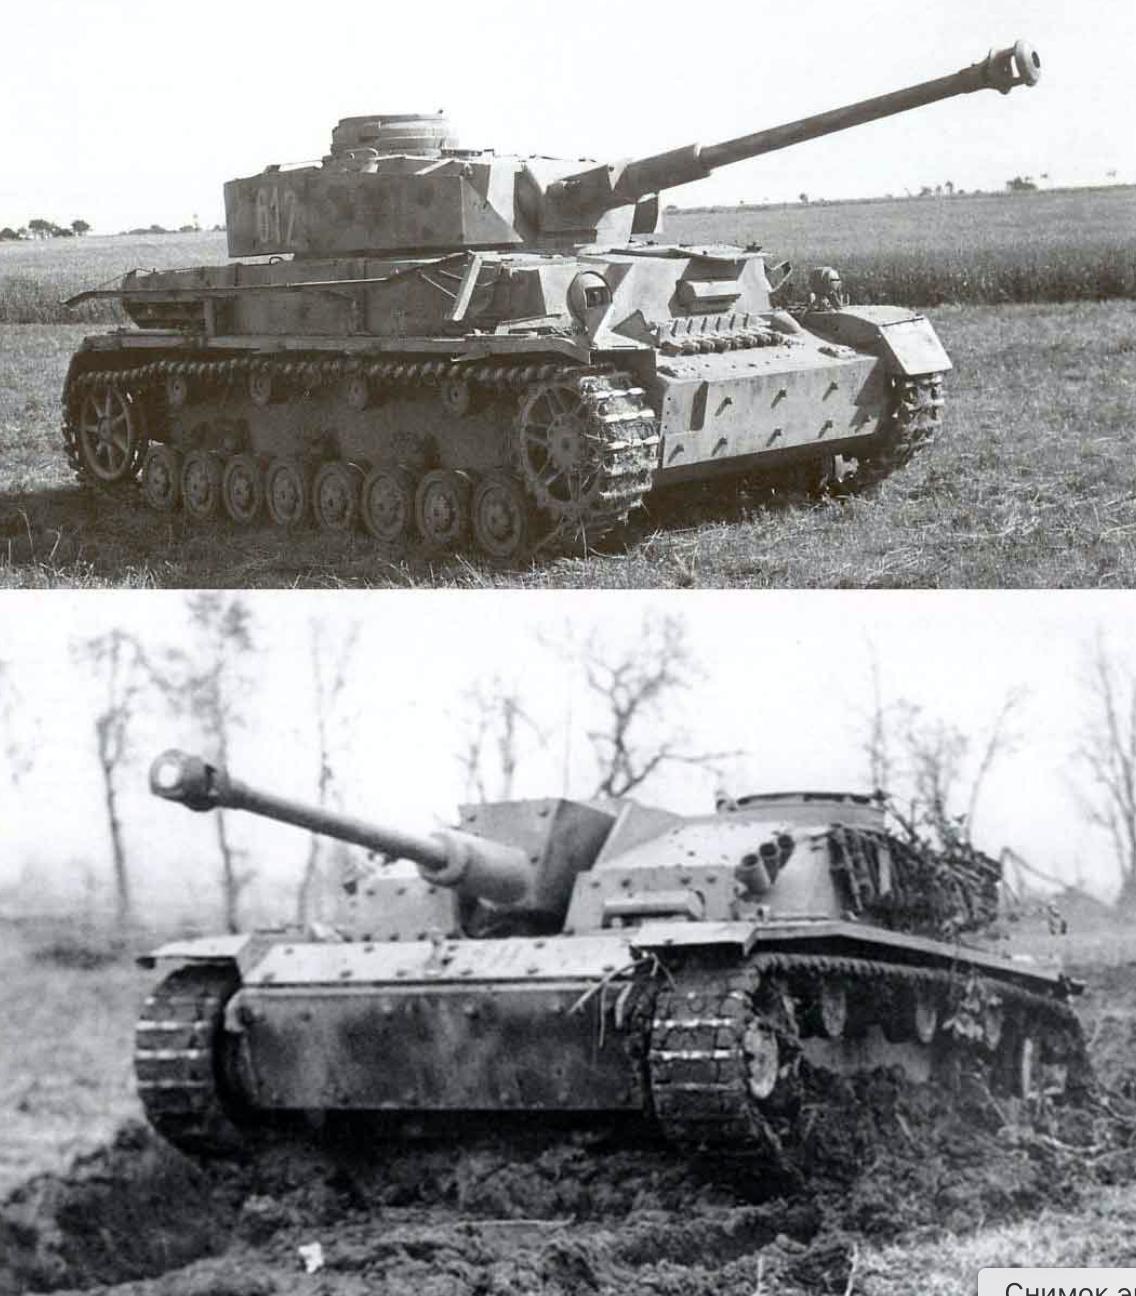 Немачки средњи тенк Panzerkampfwagen IV (Pz.Kpfw. IV) и јуришна самохотка Sturmgeschütz III (StuG III)